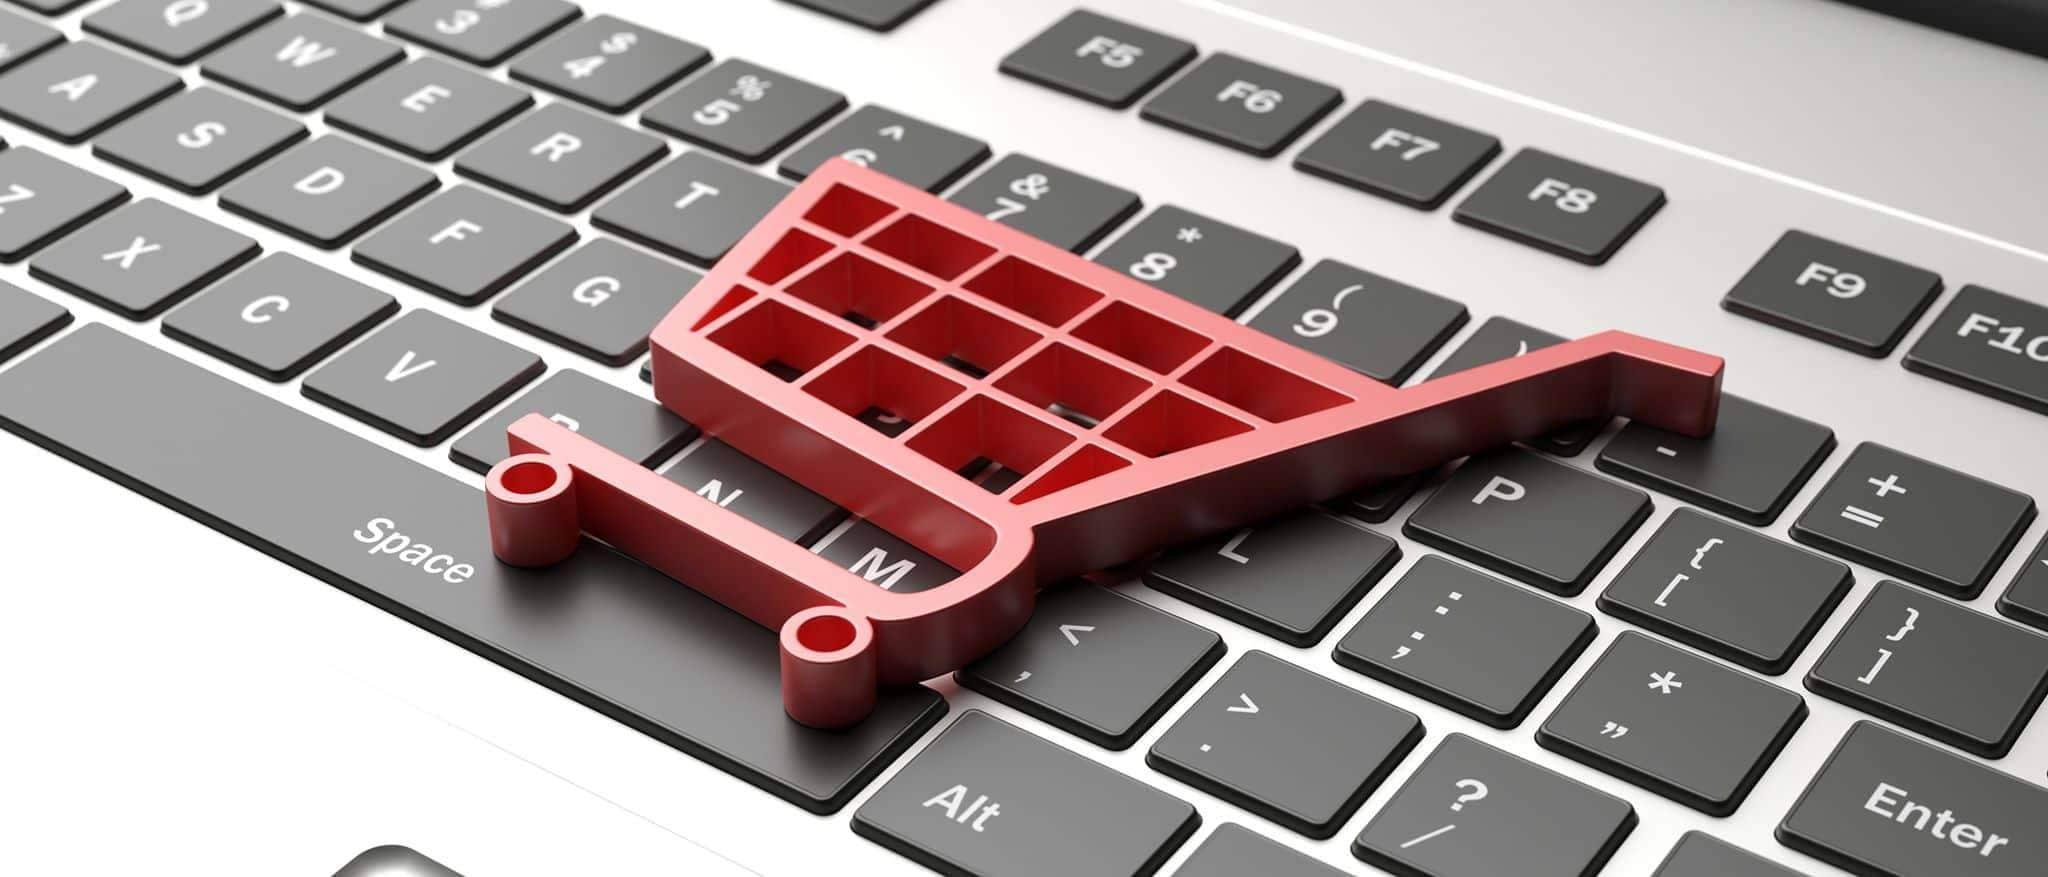 Como Montar Um E Commerce - Como montar um e-commerce?